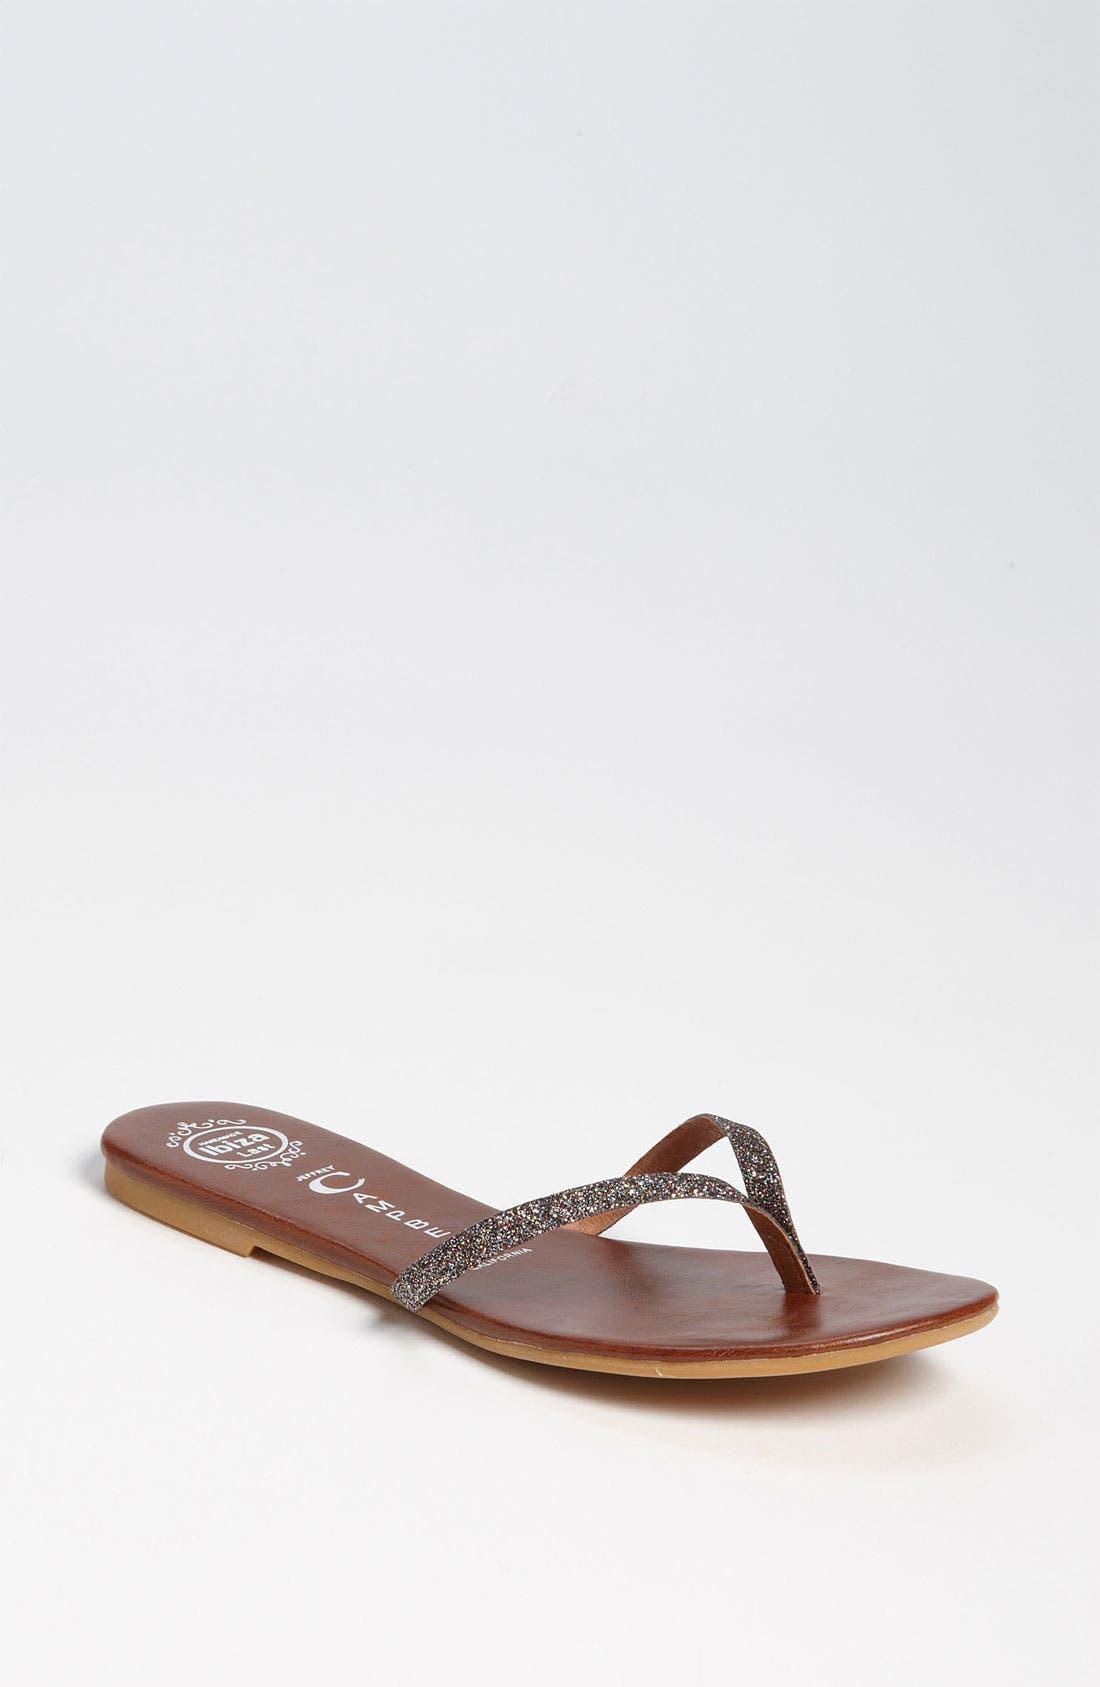 Main Image - Jeffrey Campbell 'Magma' Sandal